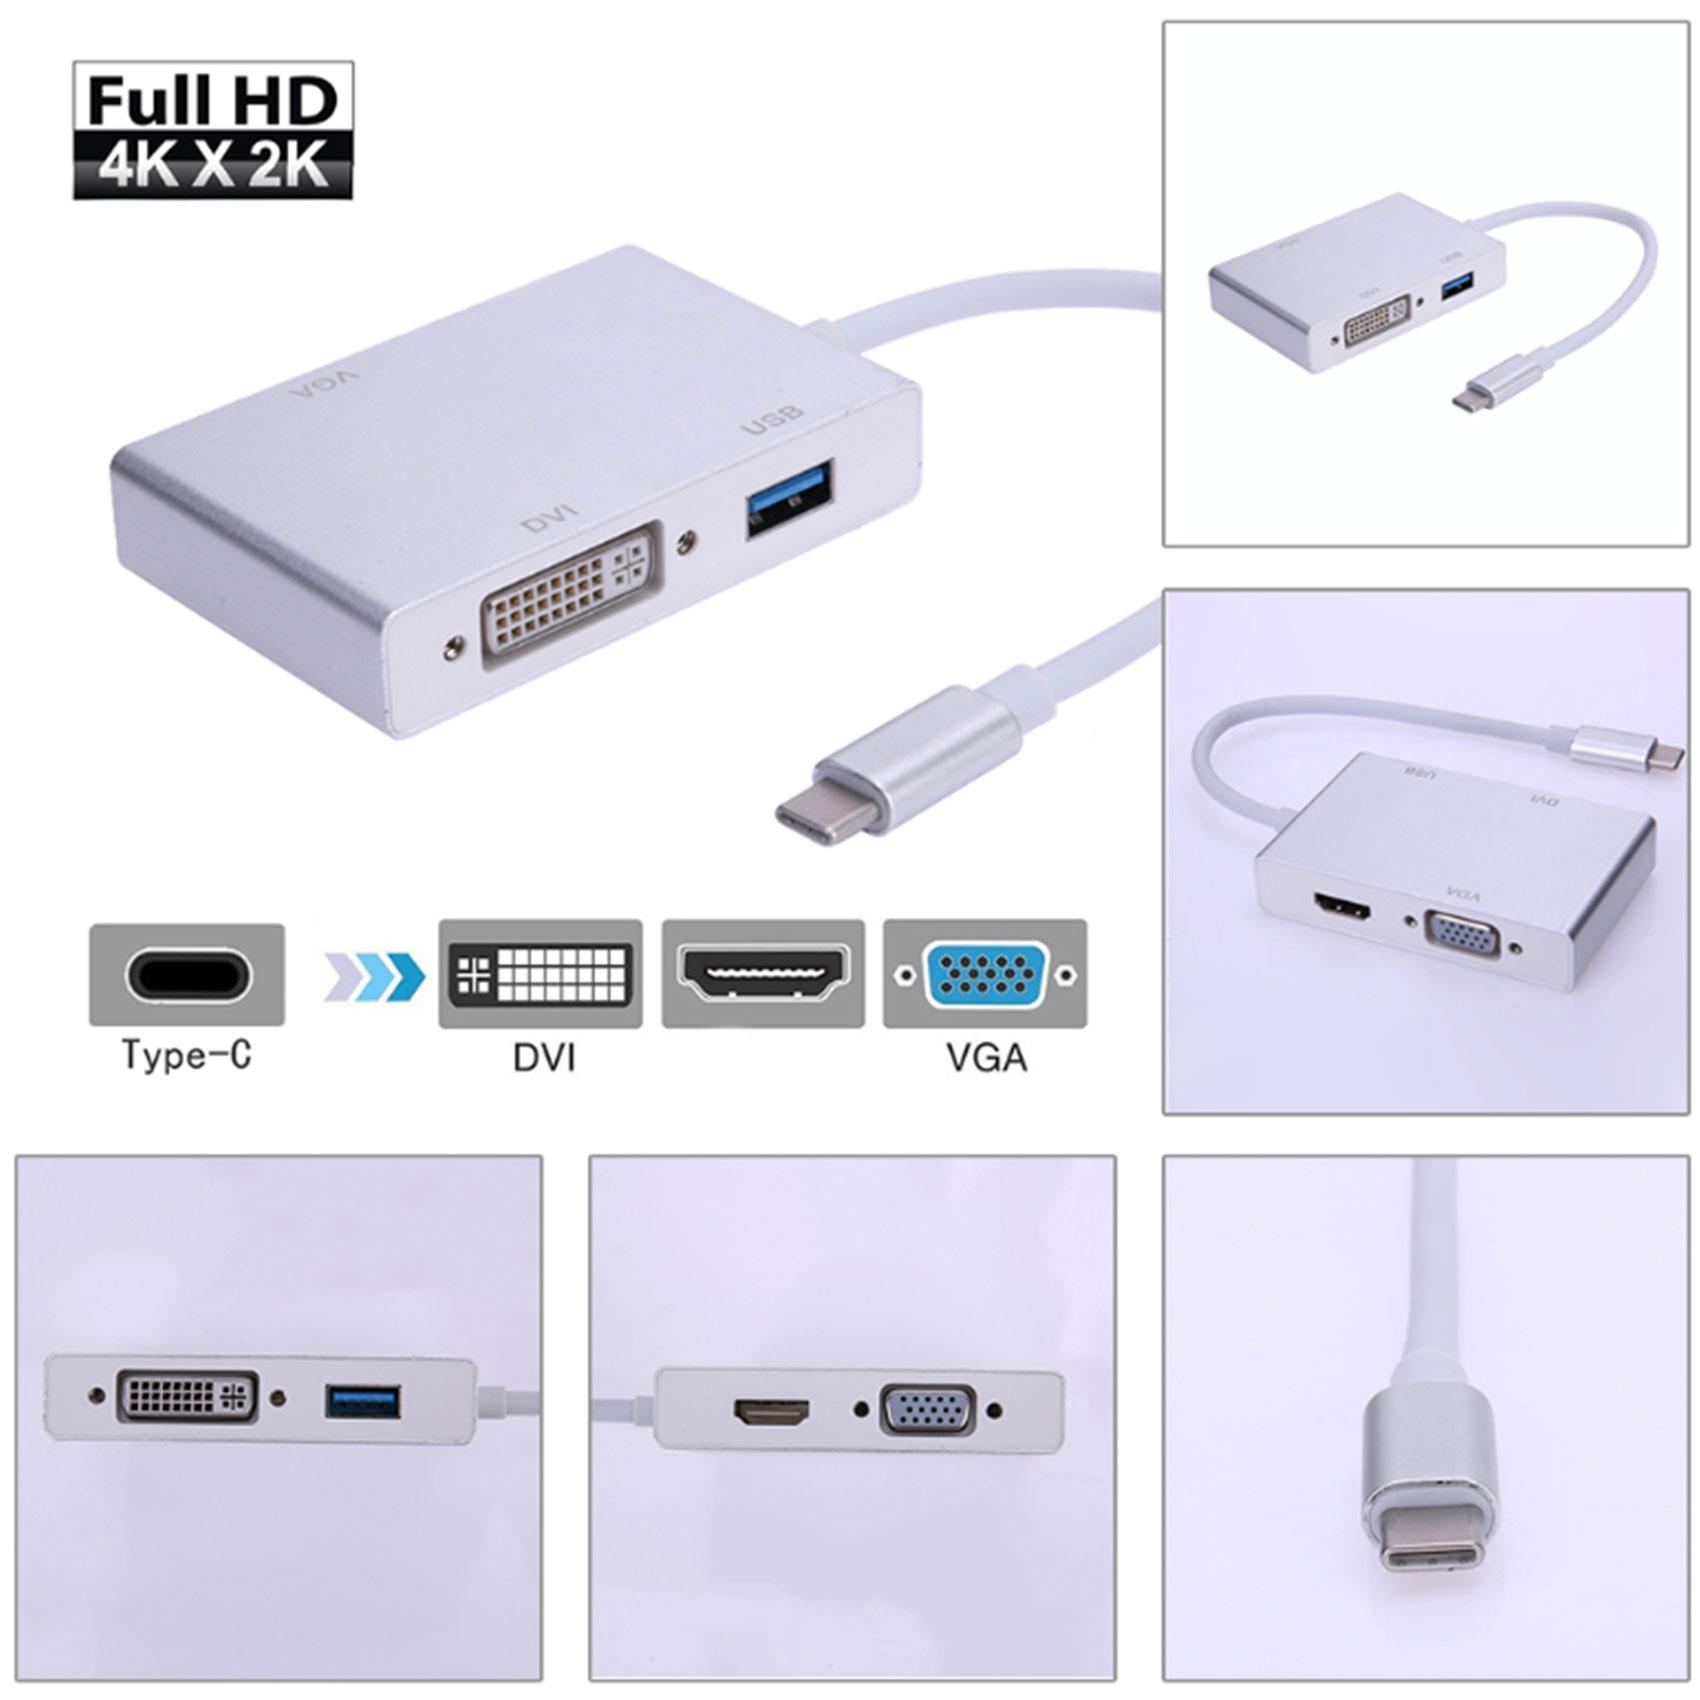 Type-C  To HDMI VGA  DVI  USB 3.0 Video Adapter - Silver